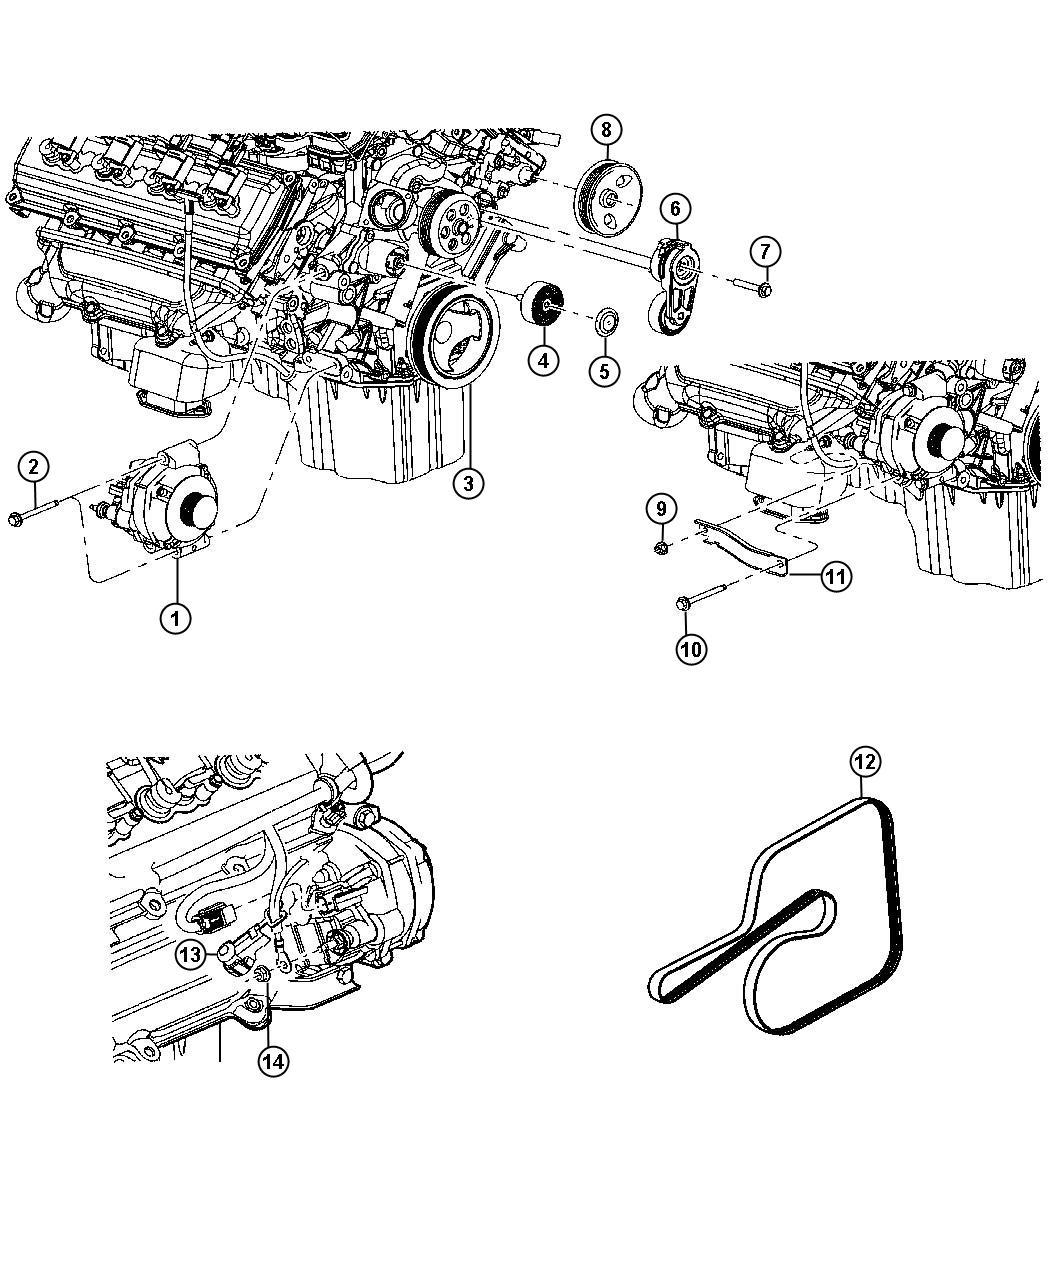 Dodge Charger Generator Engine Remanufactured 160 Amp